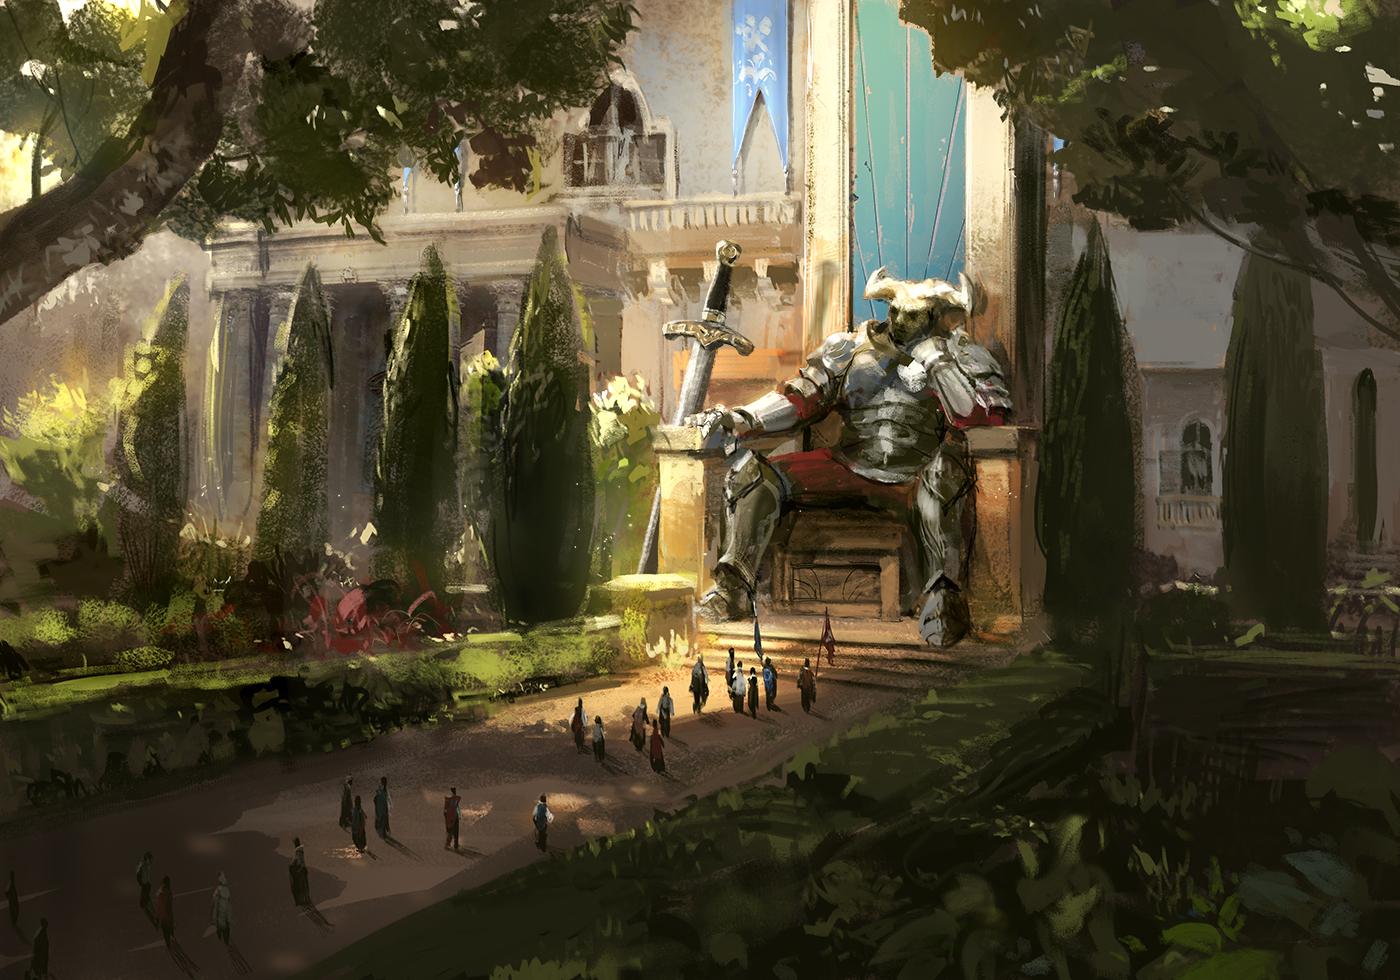 kings_garden